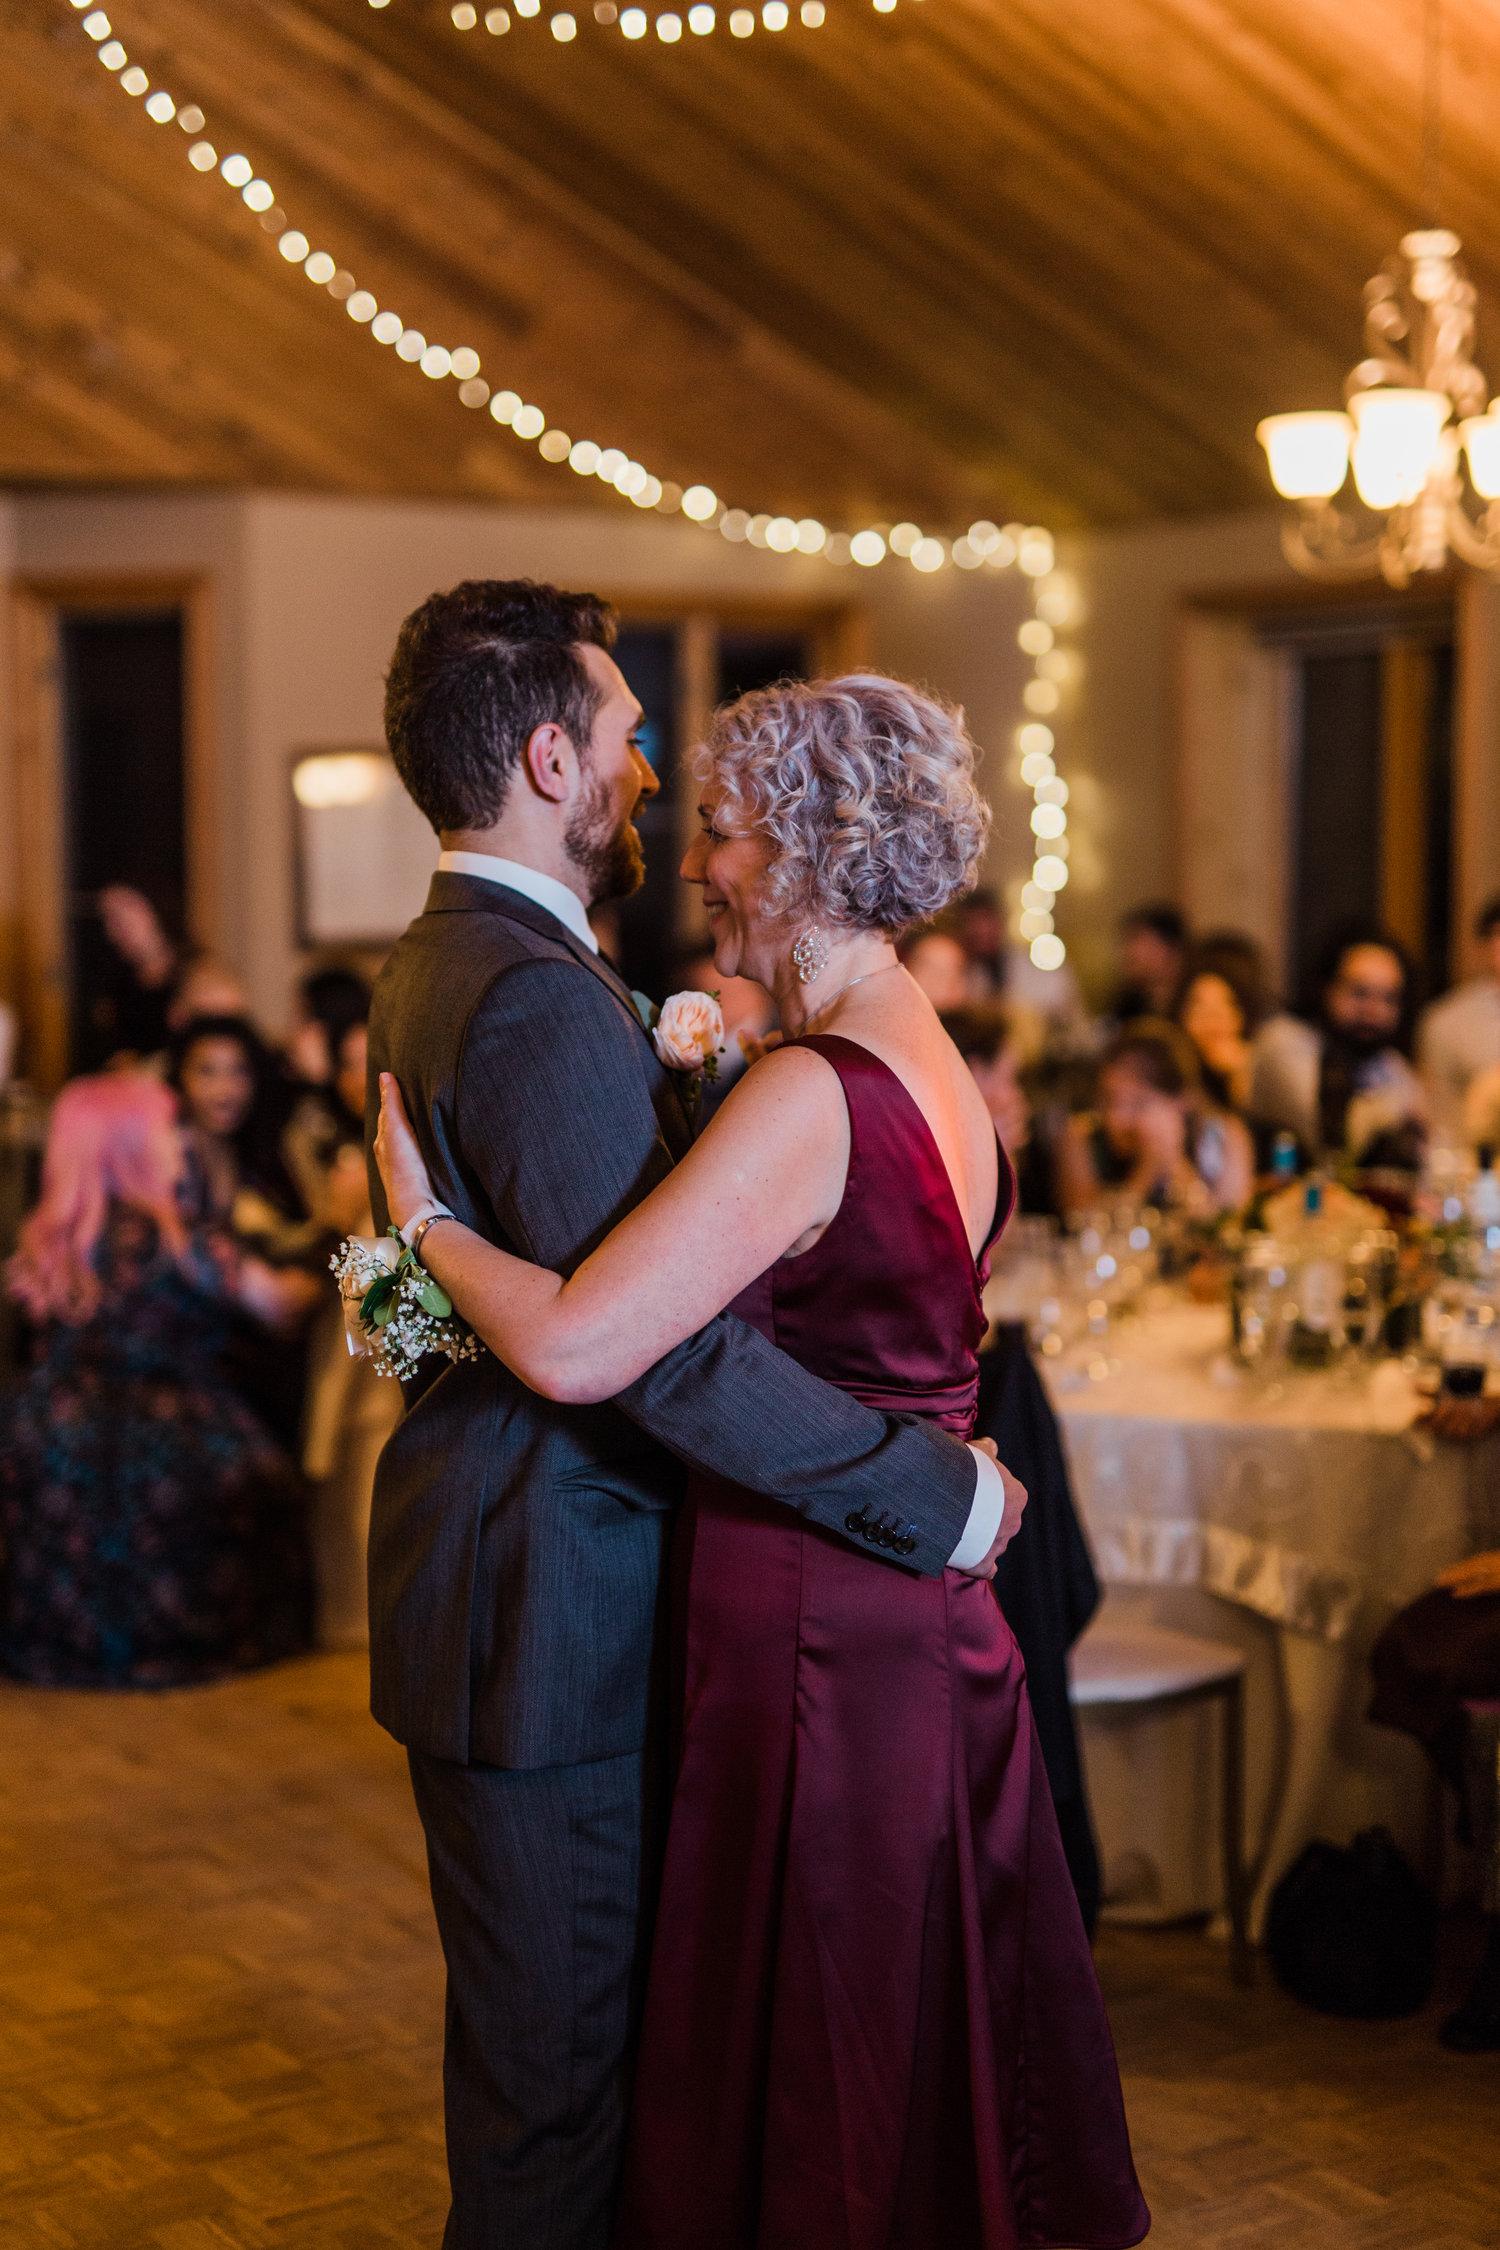 Amir-Golbazi-Danielle-Giroux-Photography_Toronto-Wedding_Cedarwood_Rachel-Paul_700.jpg